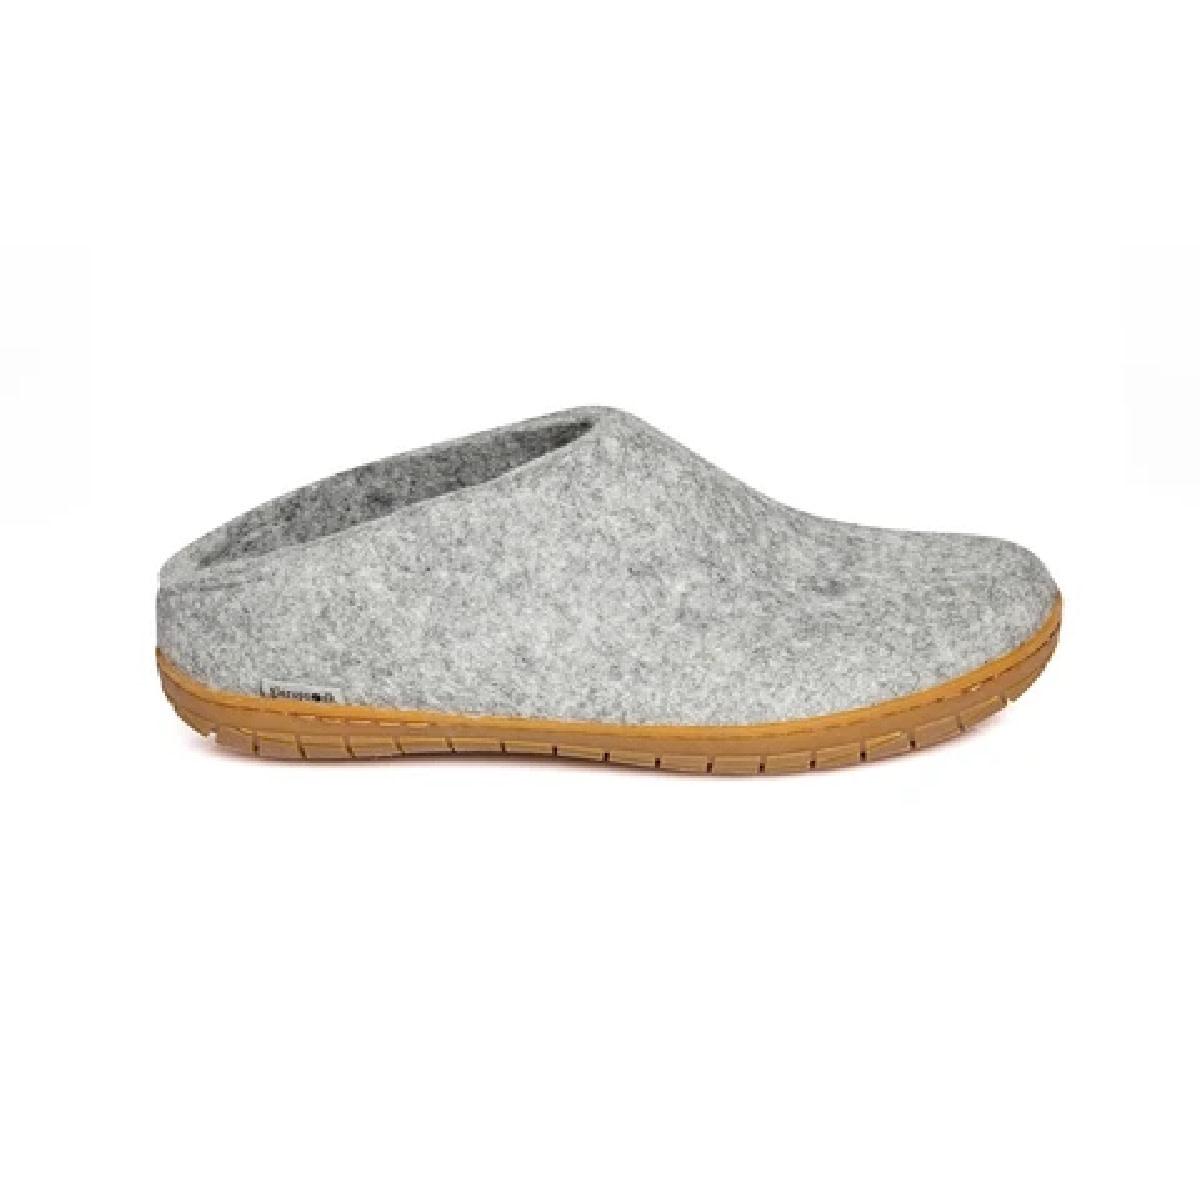 Glerups Glerups Men's Slipper Rubber Sole Grey